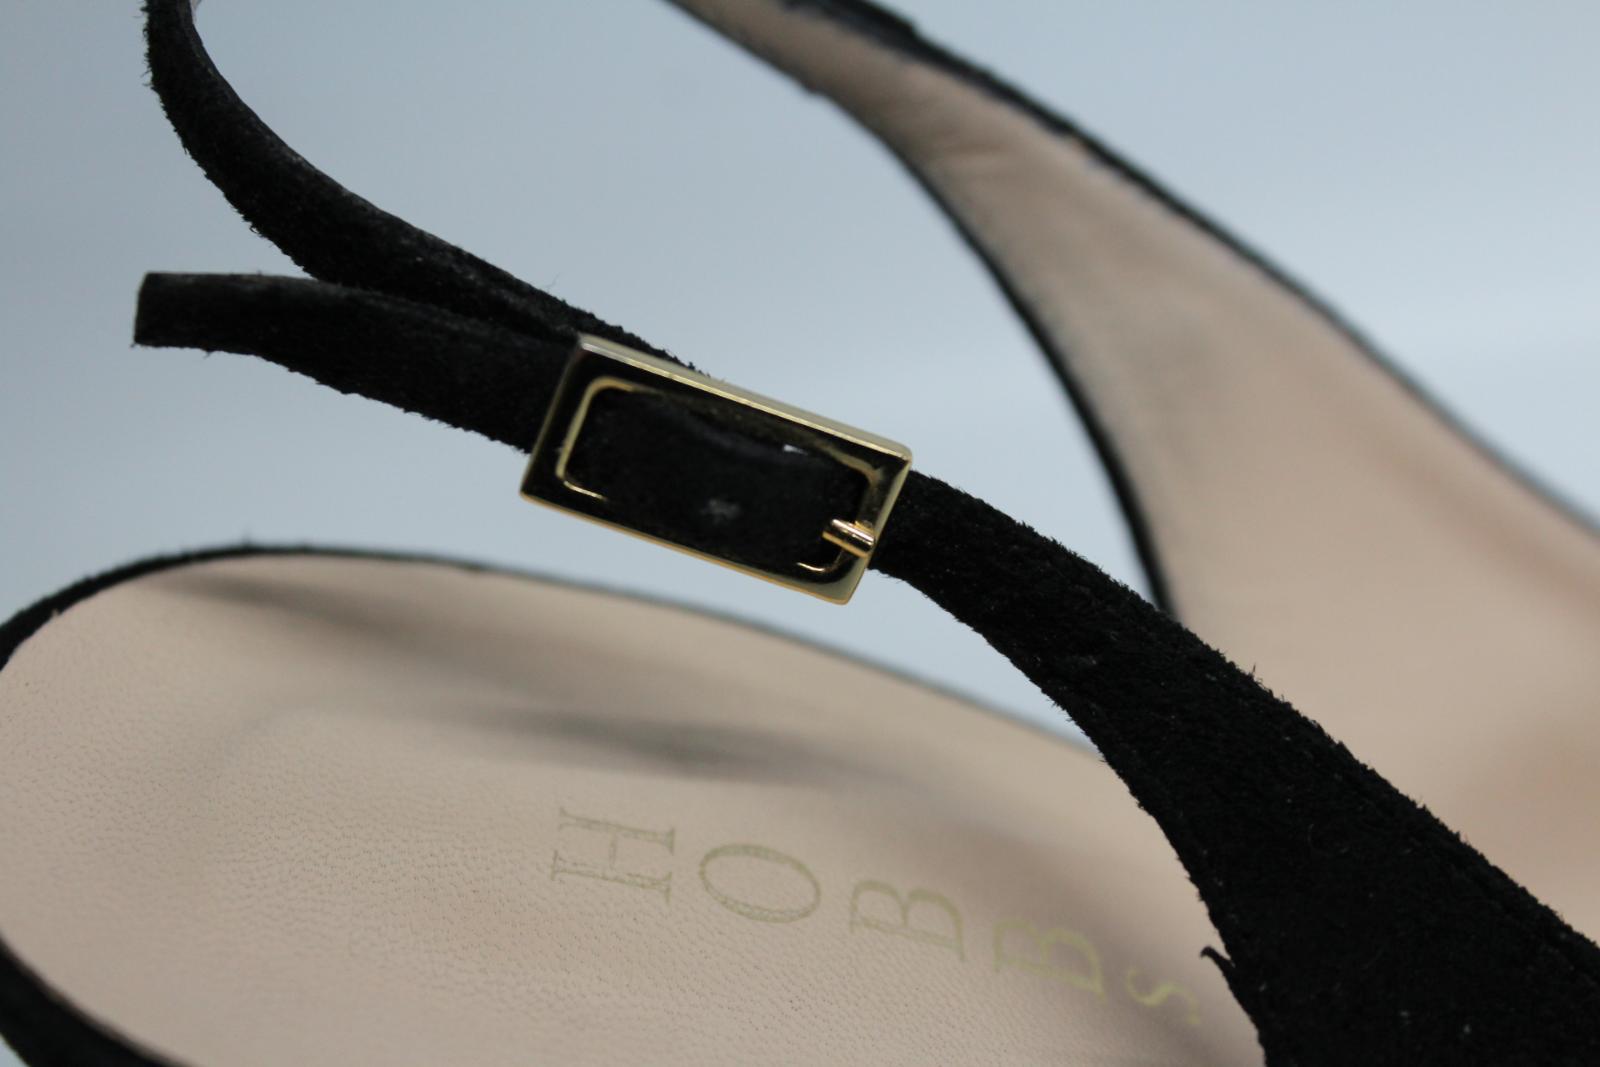 Hobbs-femmes-en-daim-noir-Sling-Arriere-bout-pointu-et-talon-aiguille-Chaussure-UK6-5-EU39-5 miniature 11